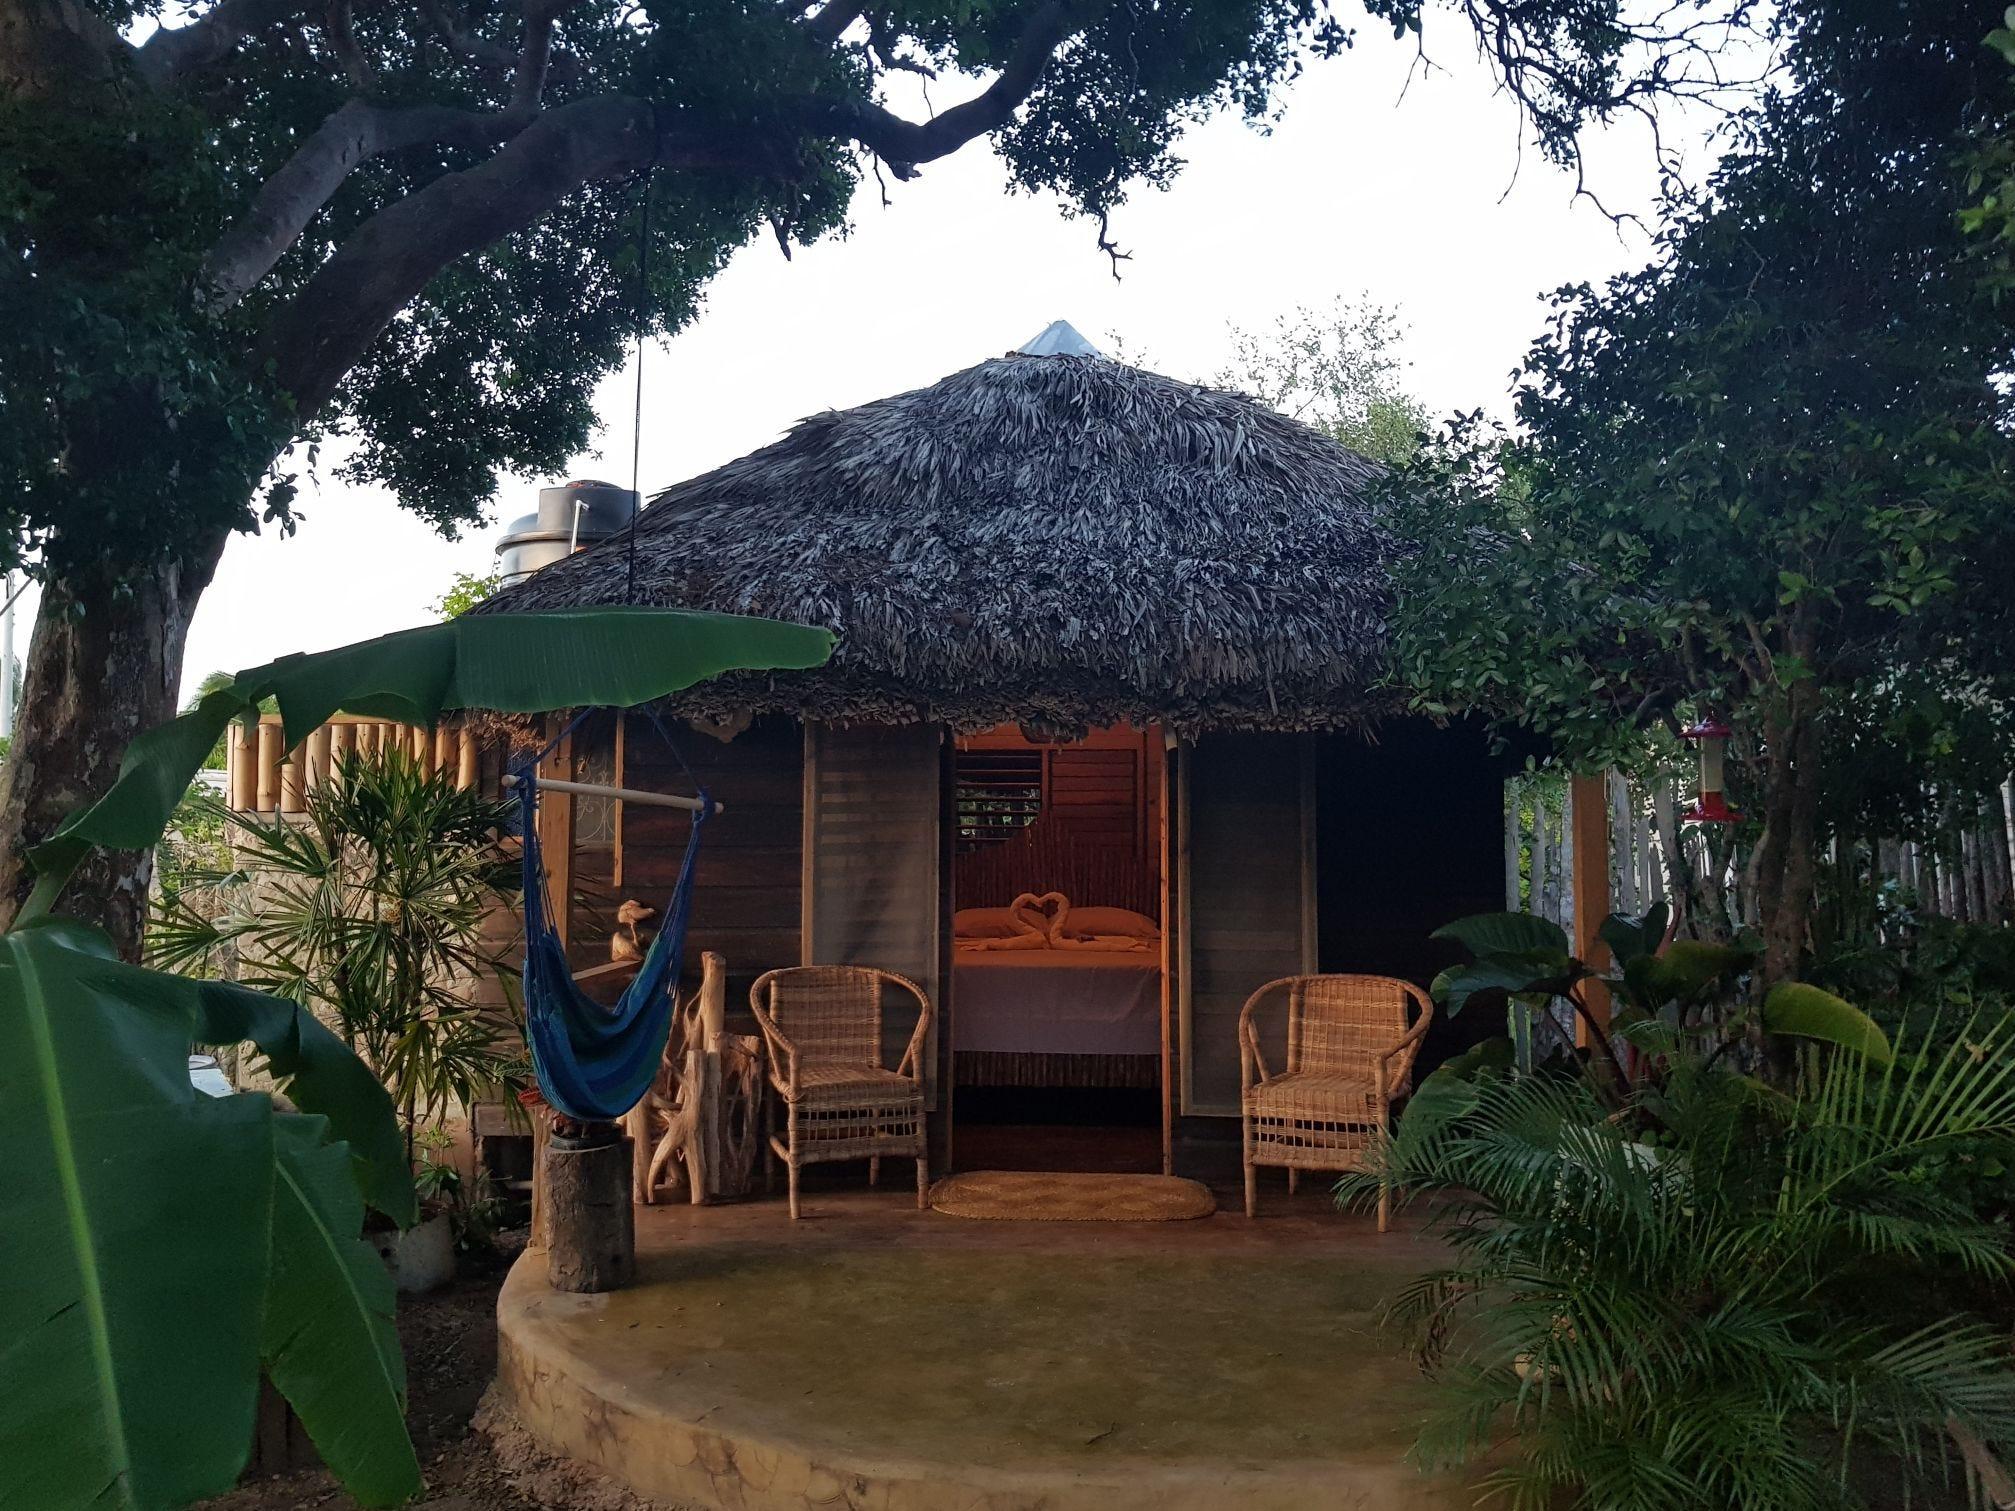 Exterior look at cabin in Jamaica